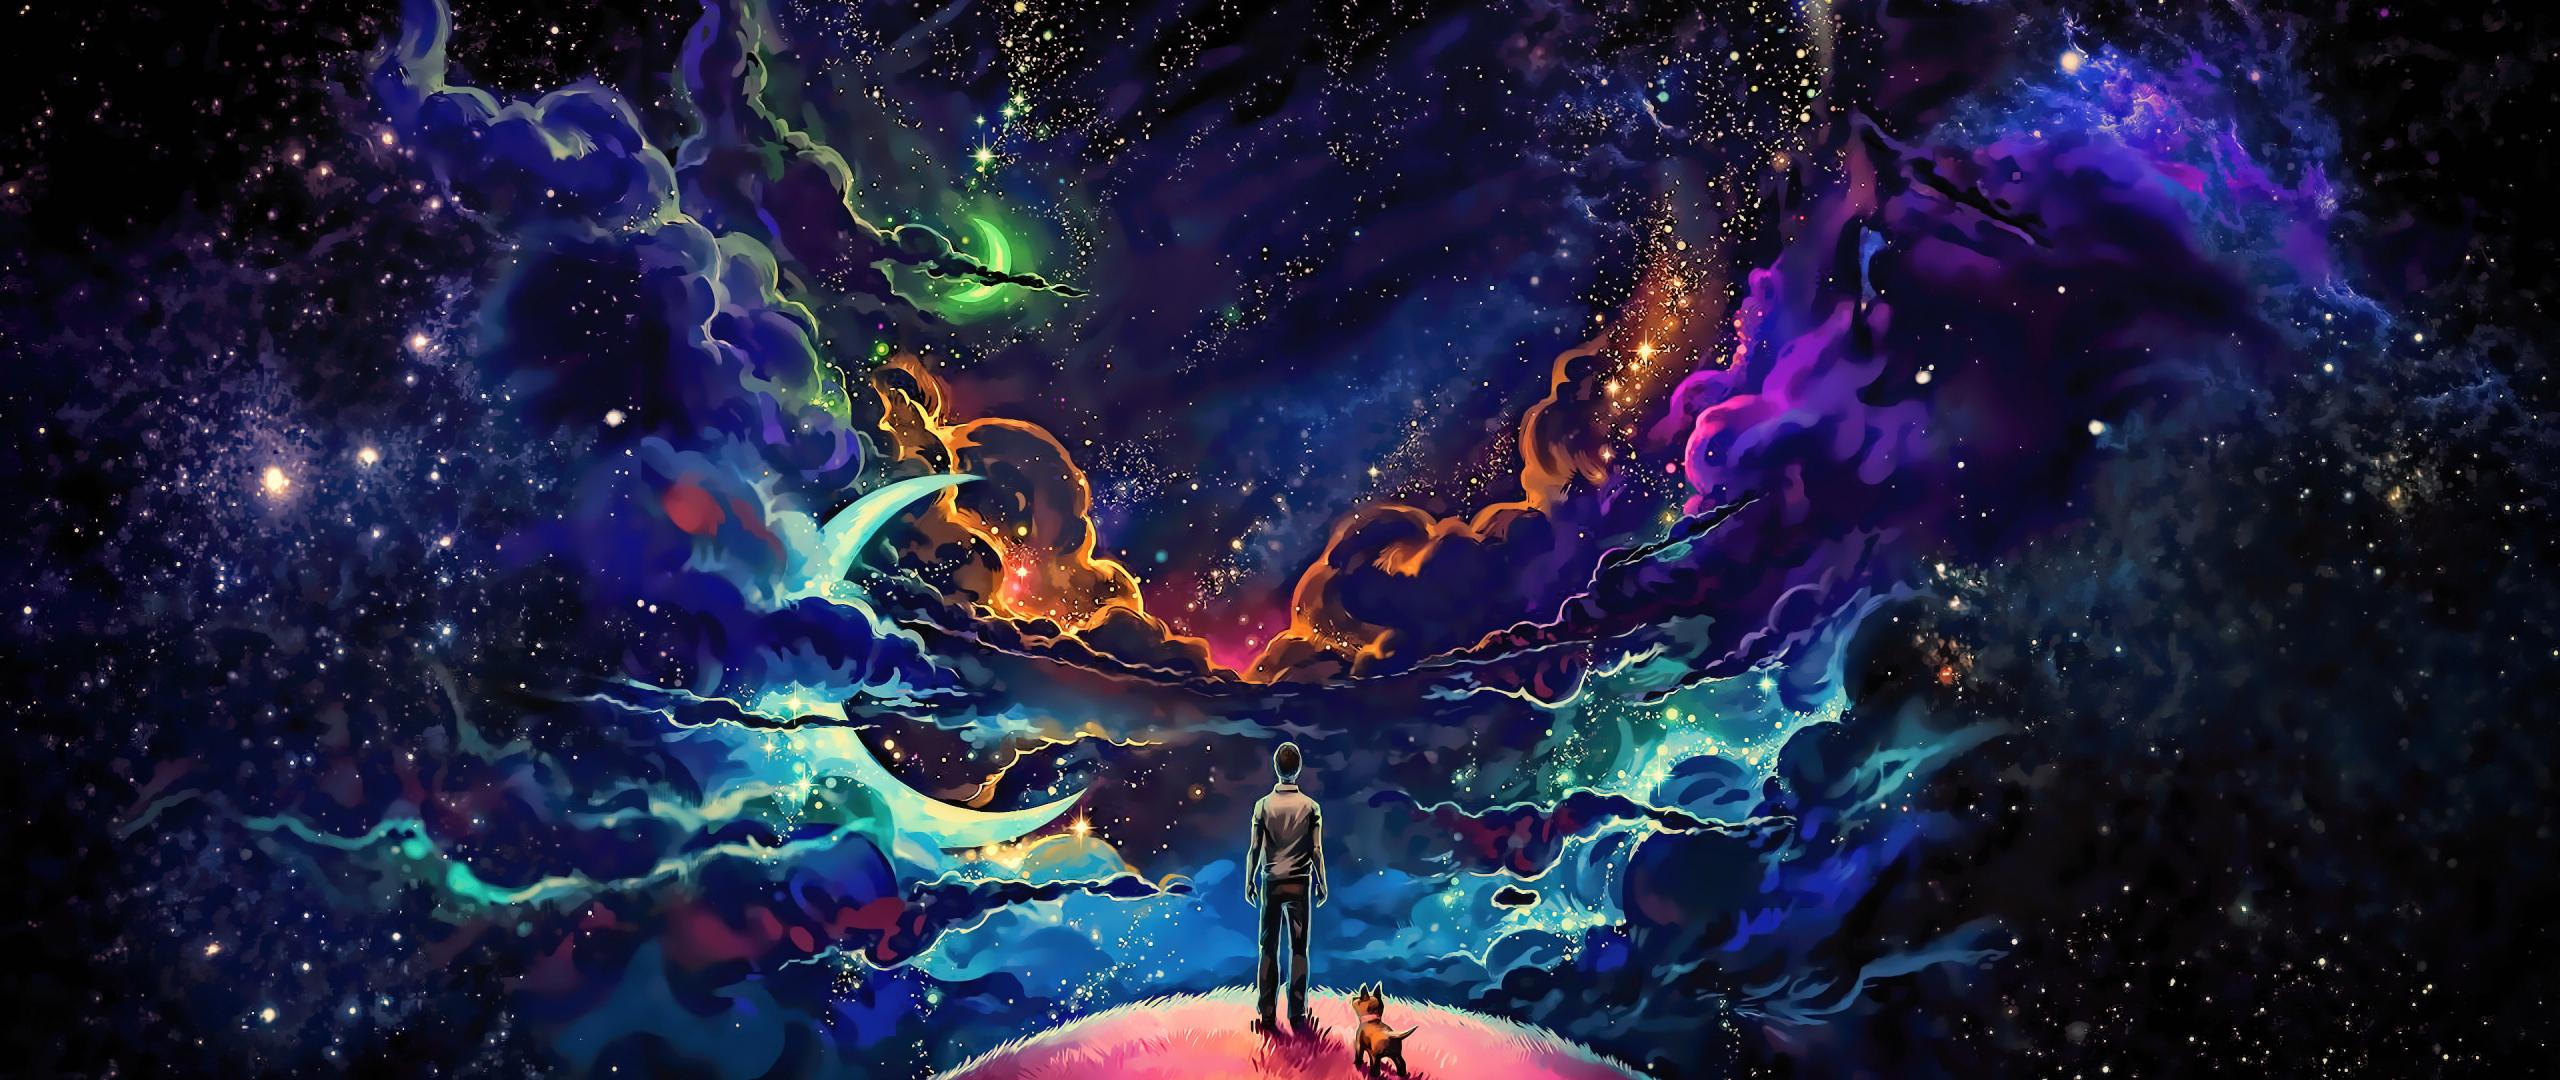 Man and dog, outdoor, clouds, fantasy, art, dark, 2560x1080 wallpaper